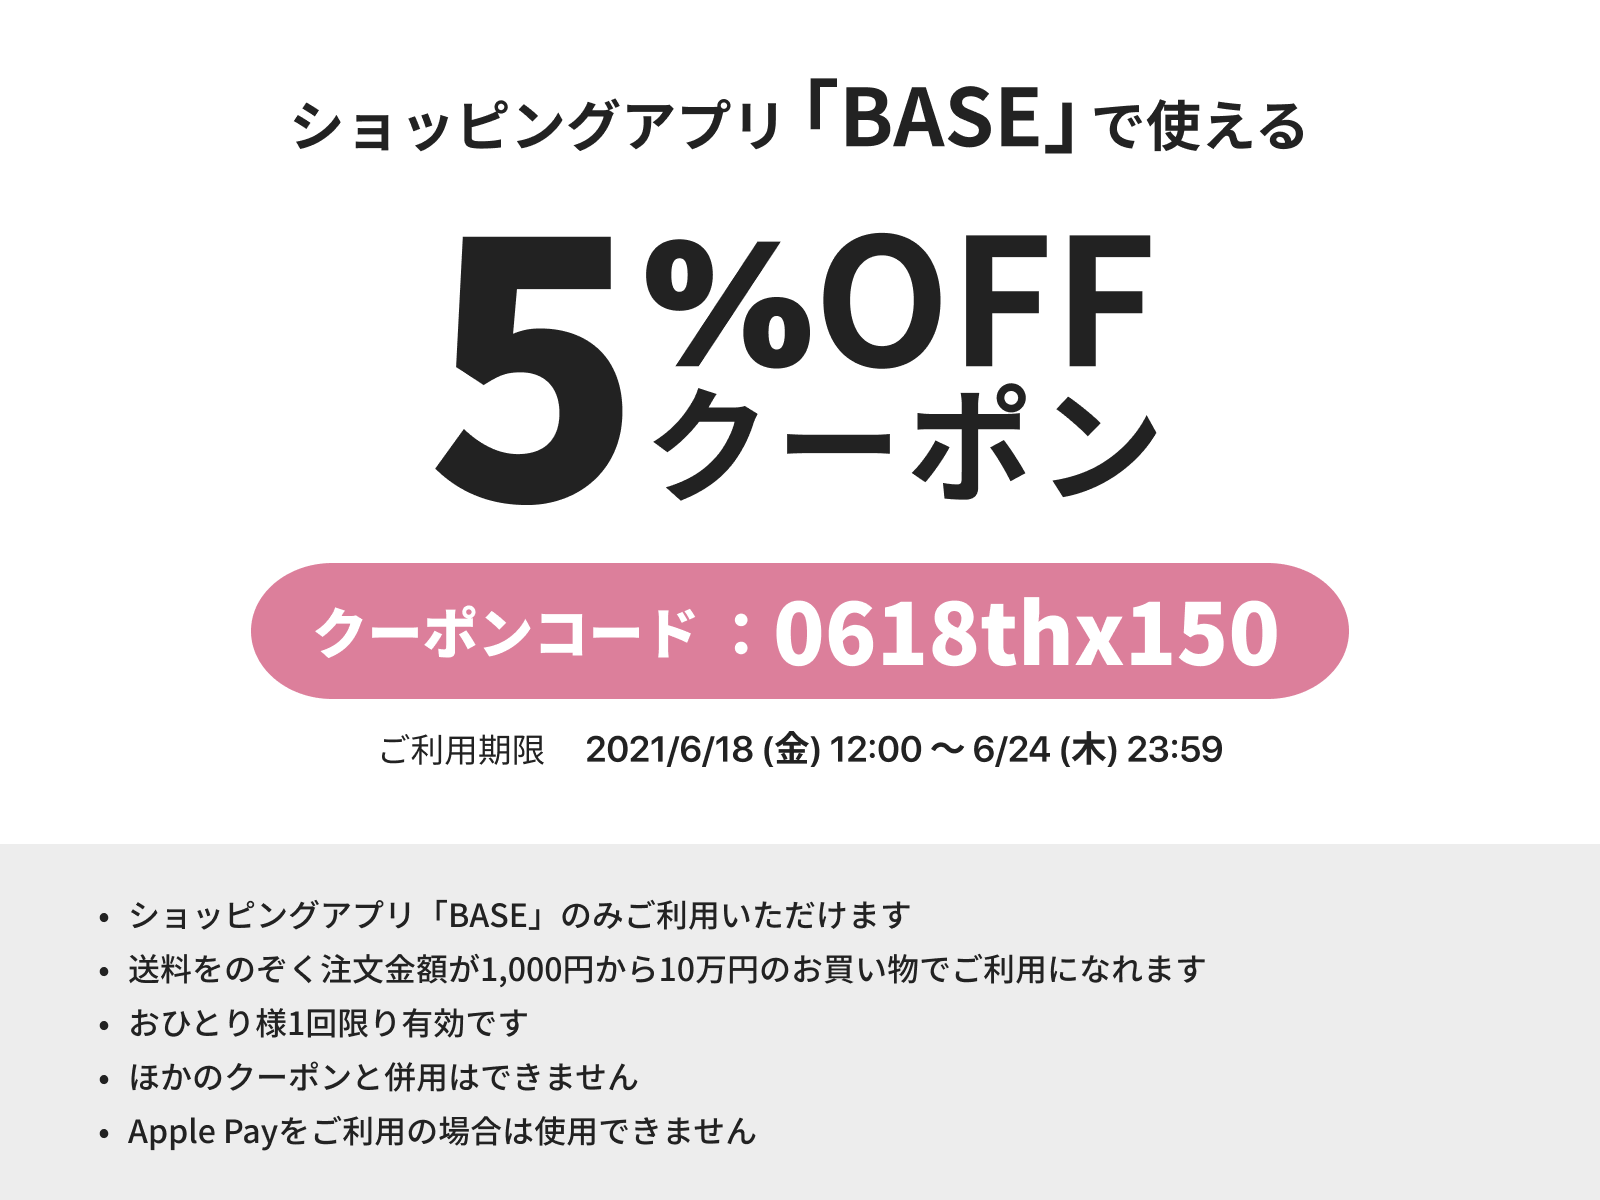 BASEアプリのショッピングで使える、5%オフクーポンプレゼント!